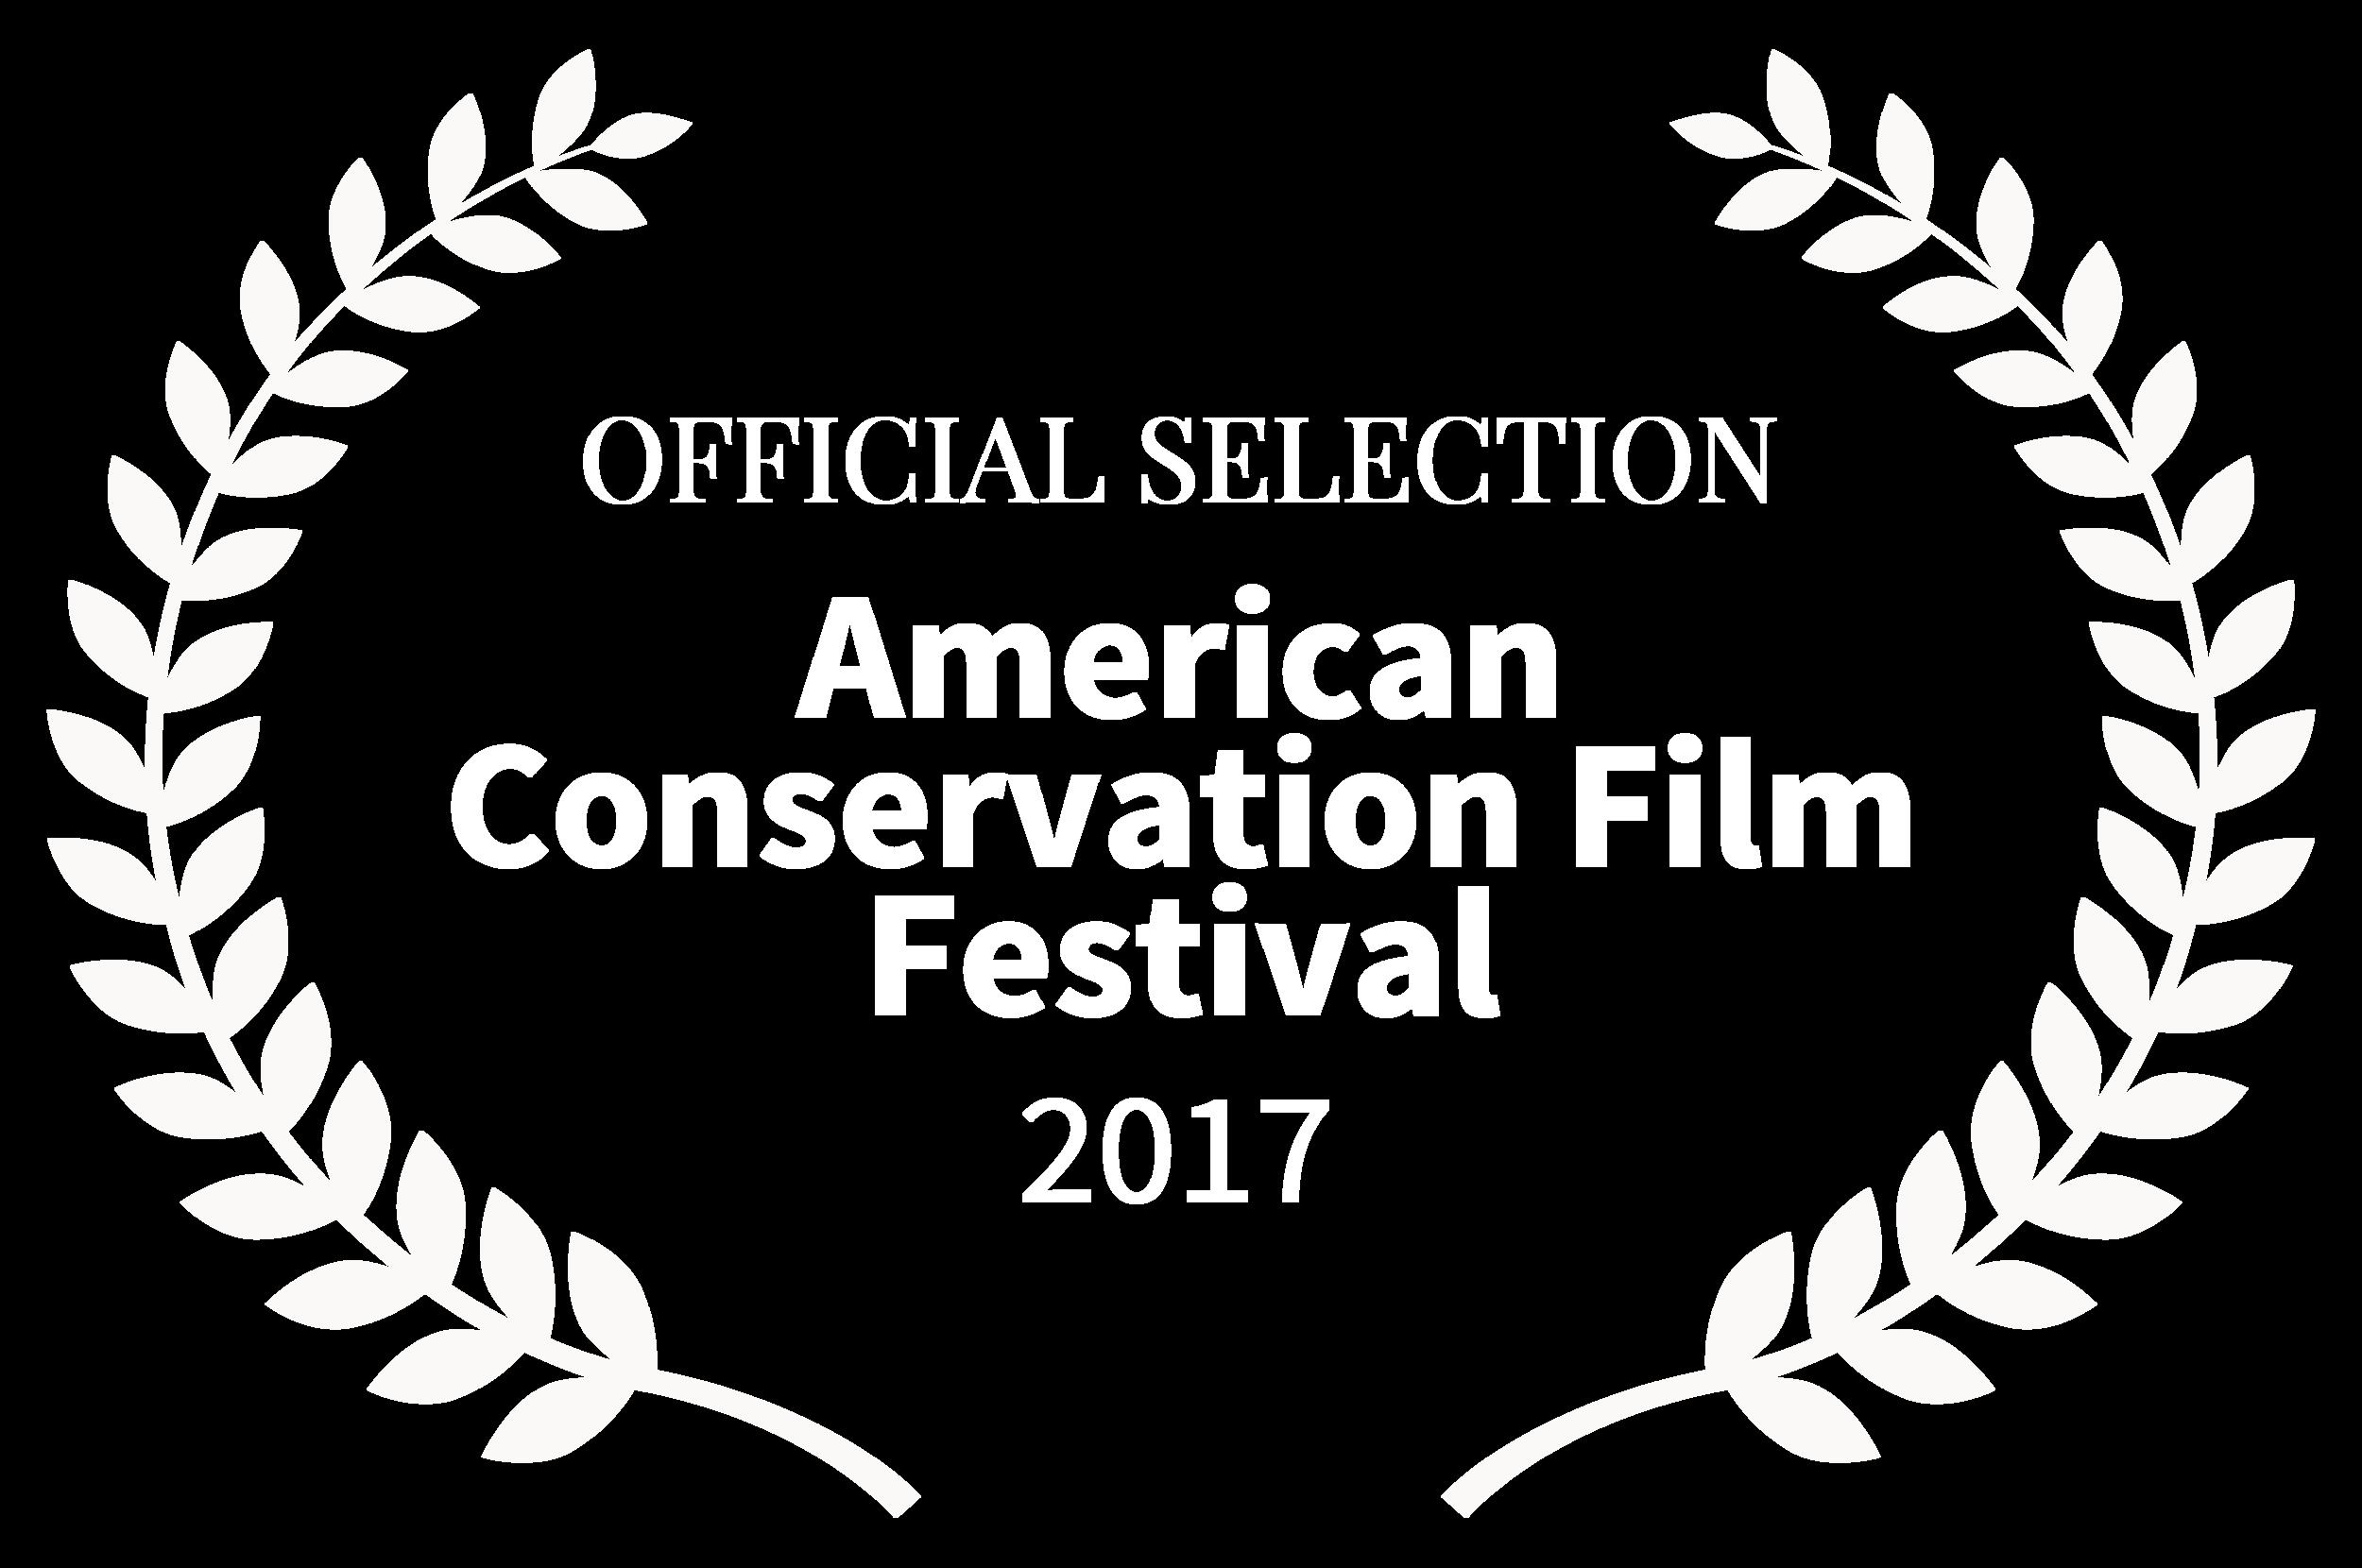 2017_AmericanConservationFF_WhiteLaurels.png